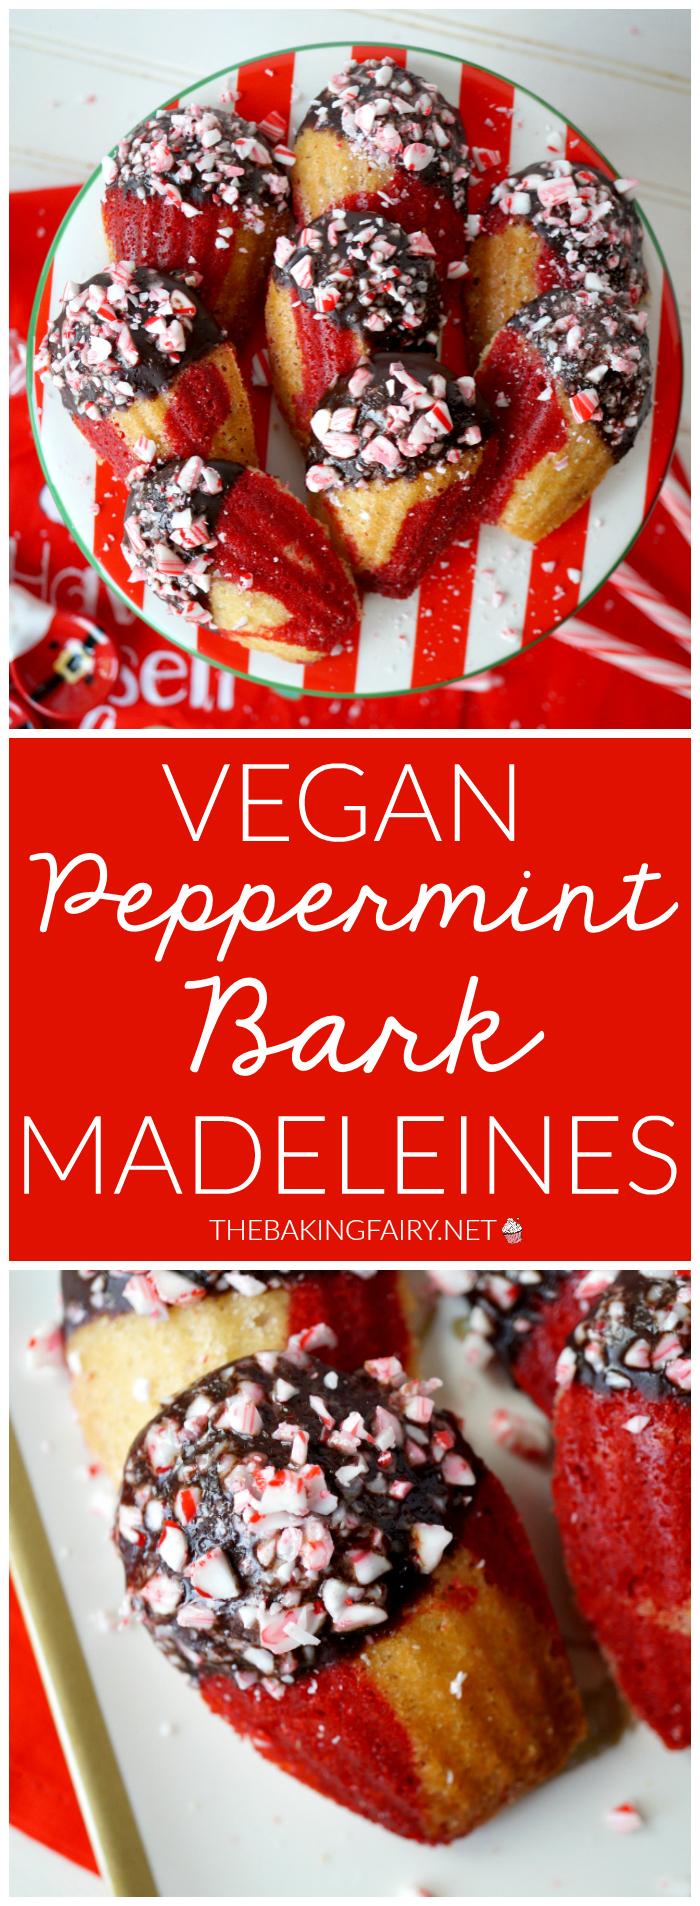 vegan peppermint bark madeleines #ChristmasCookiesWeek | The Baking Fairy